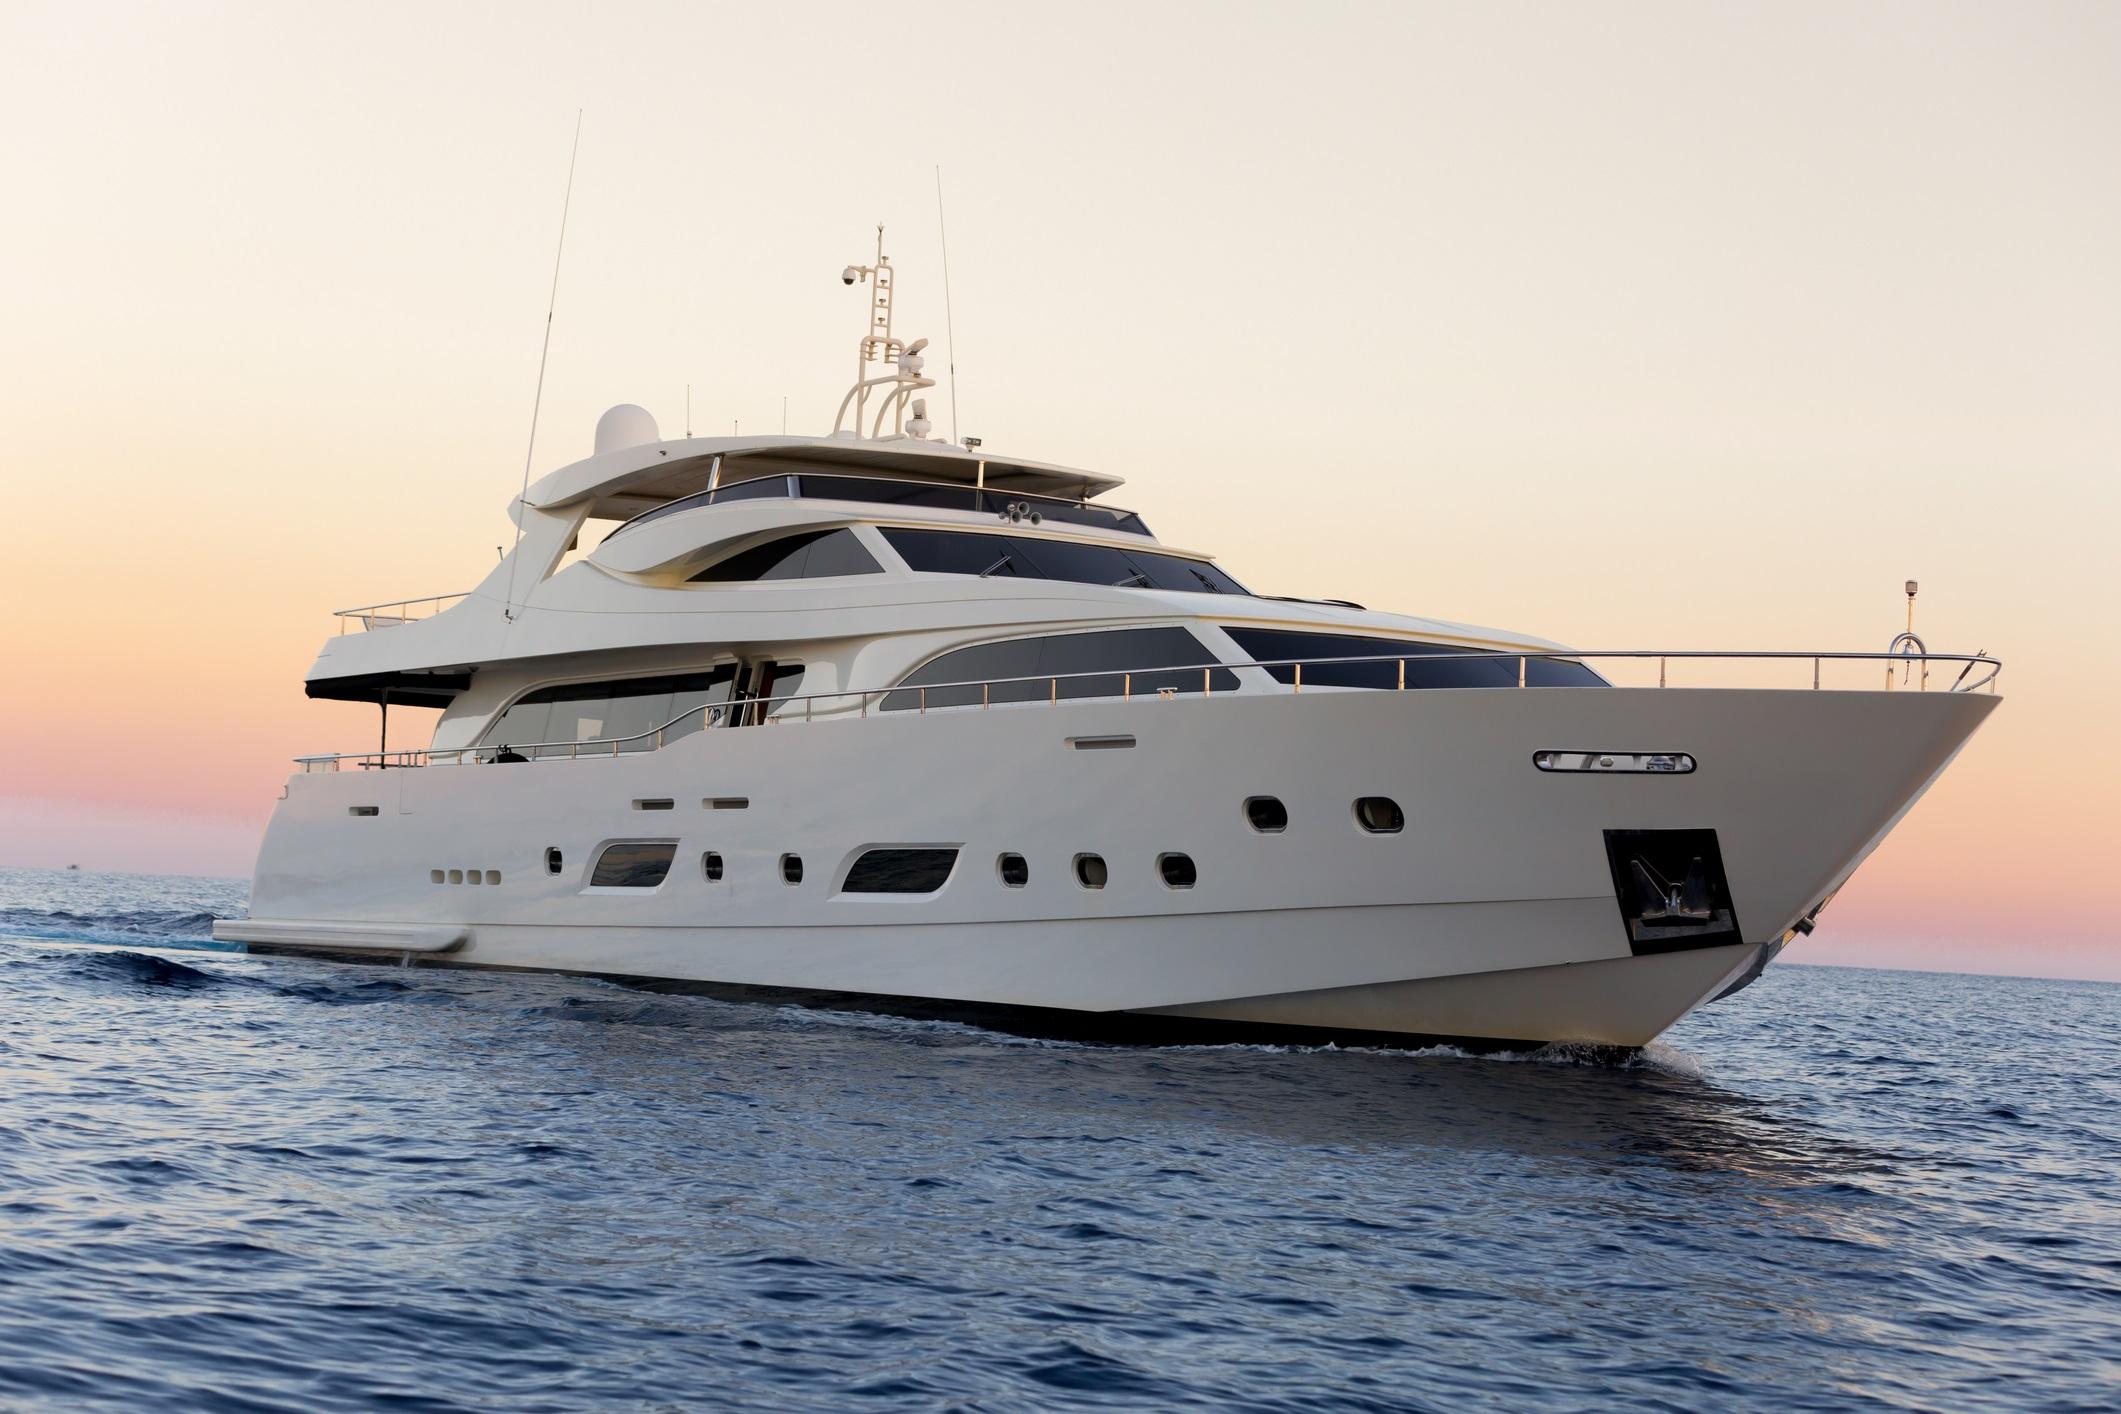 Luxury yacht sailing on the sea sunset